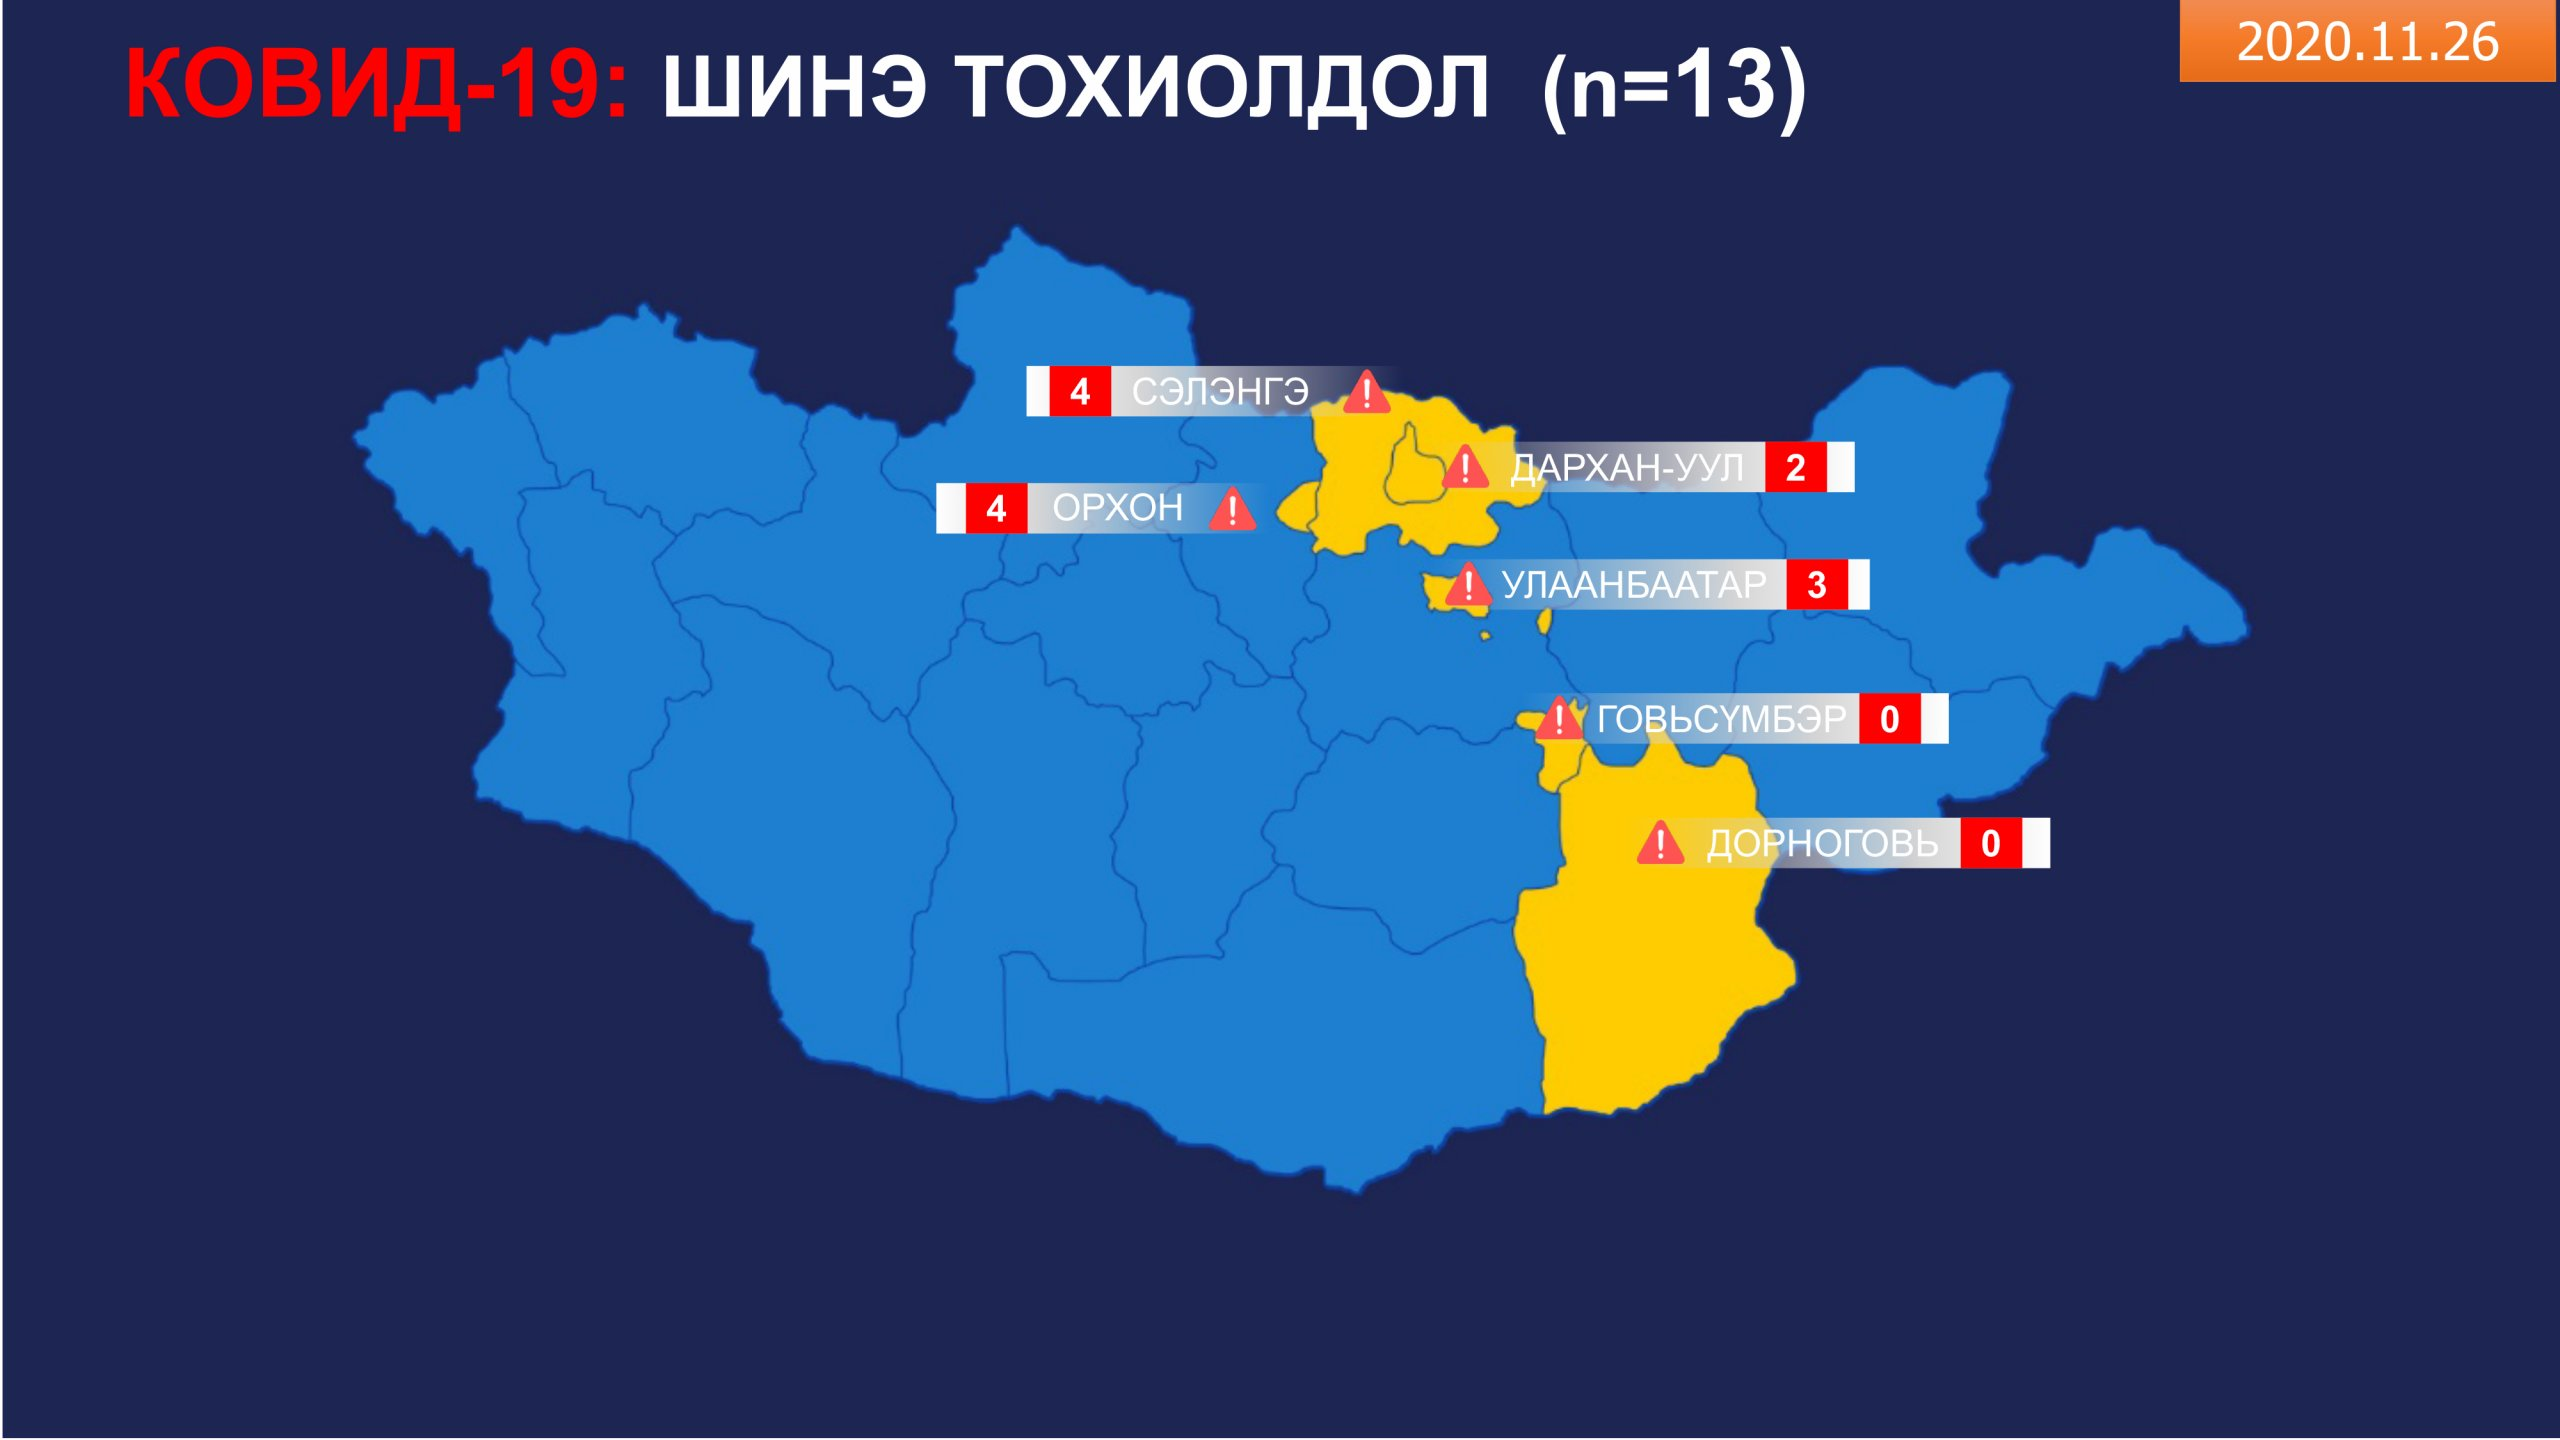 PPT-2020.11.26-2